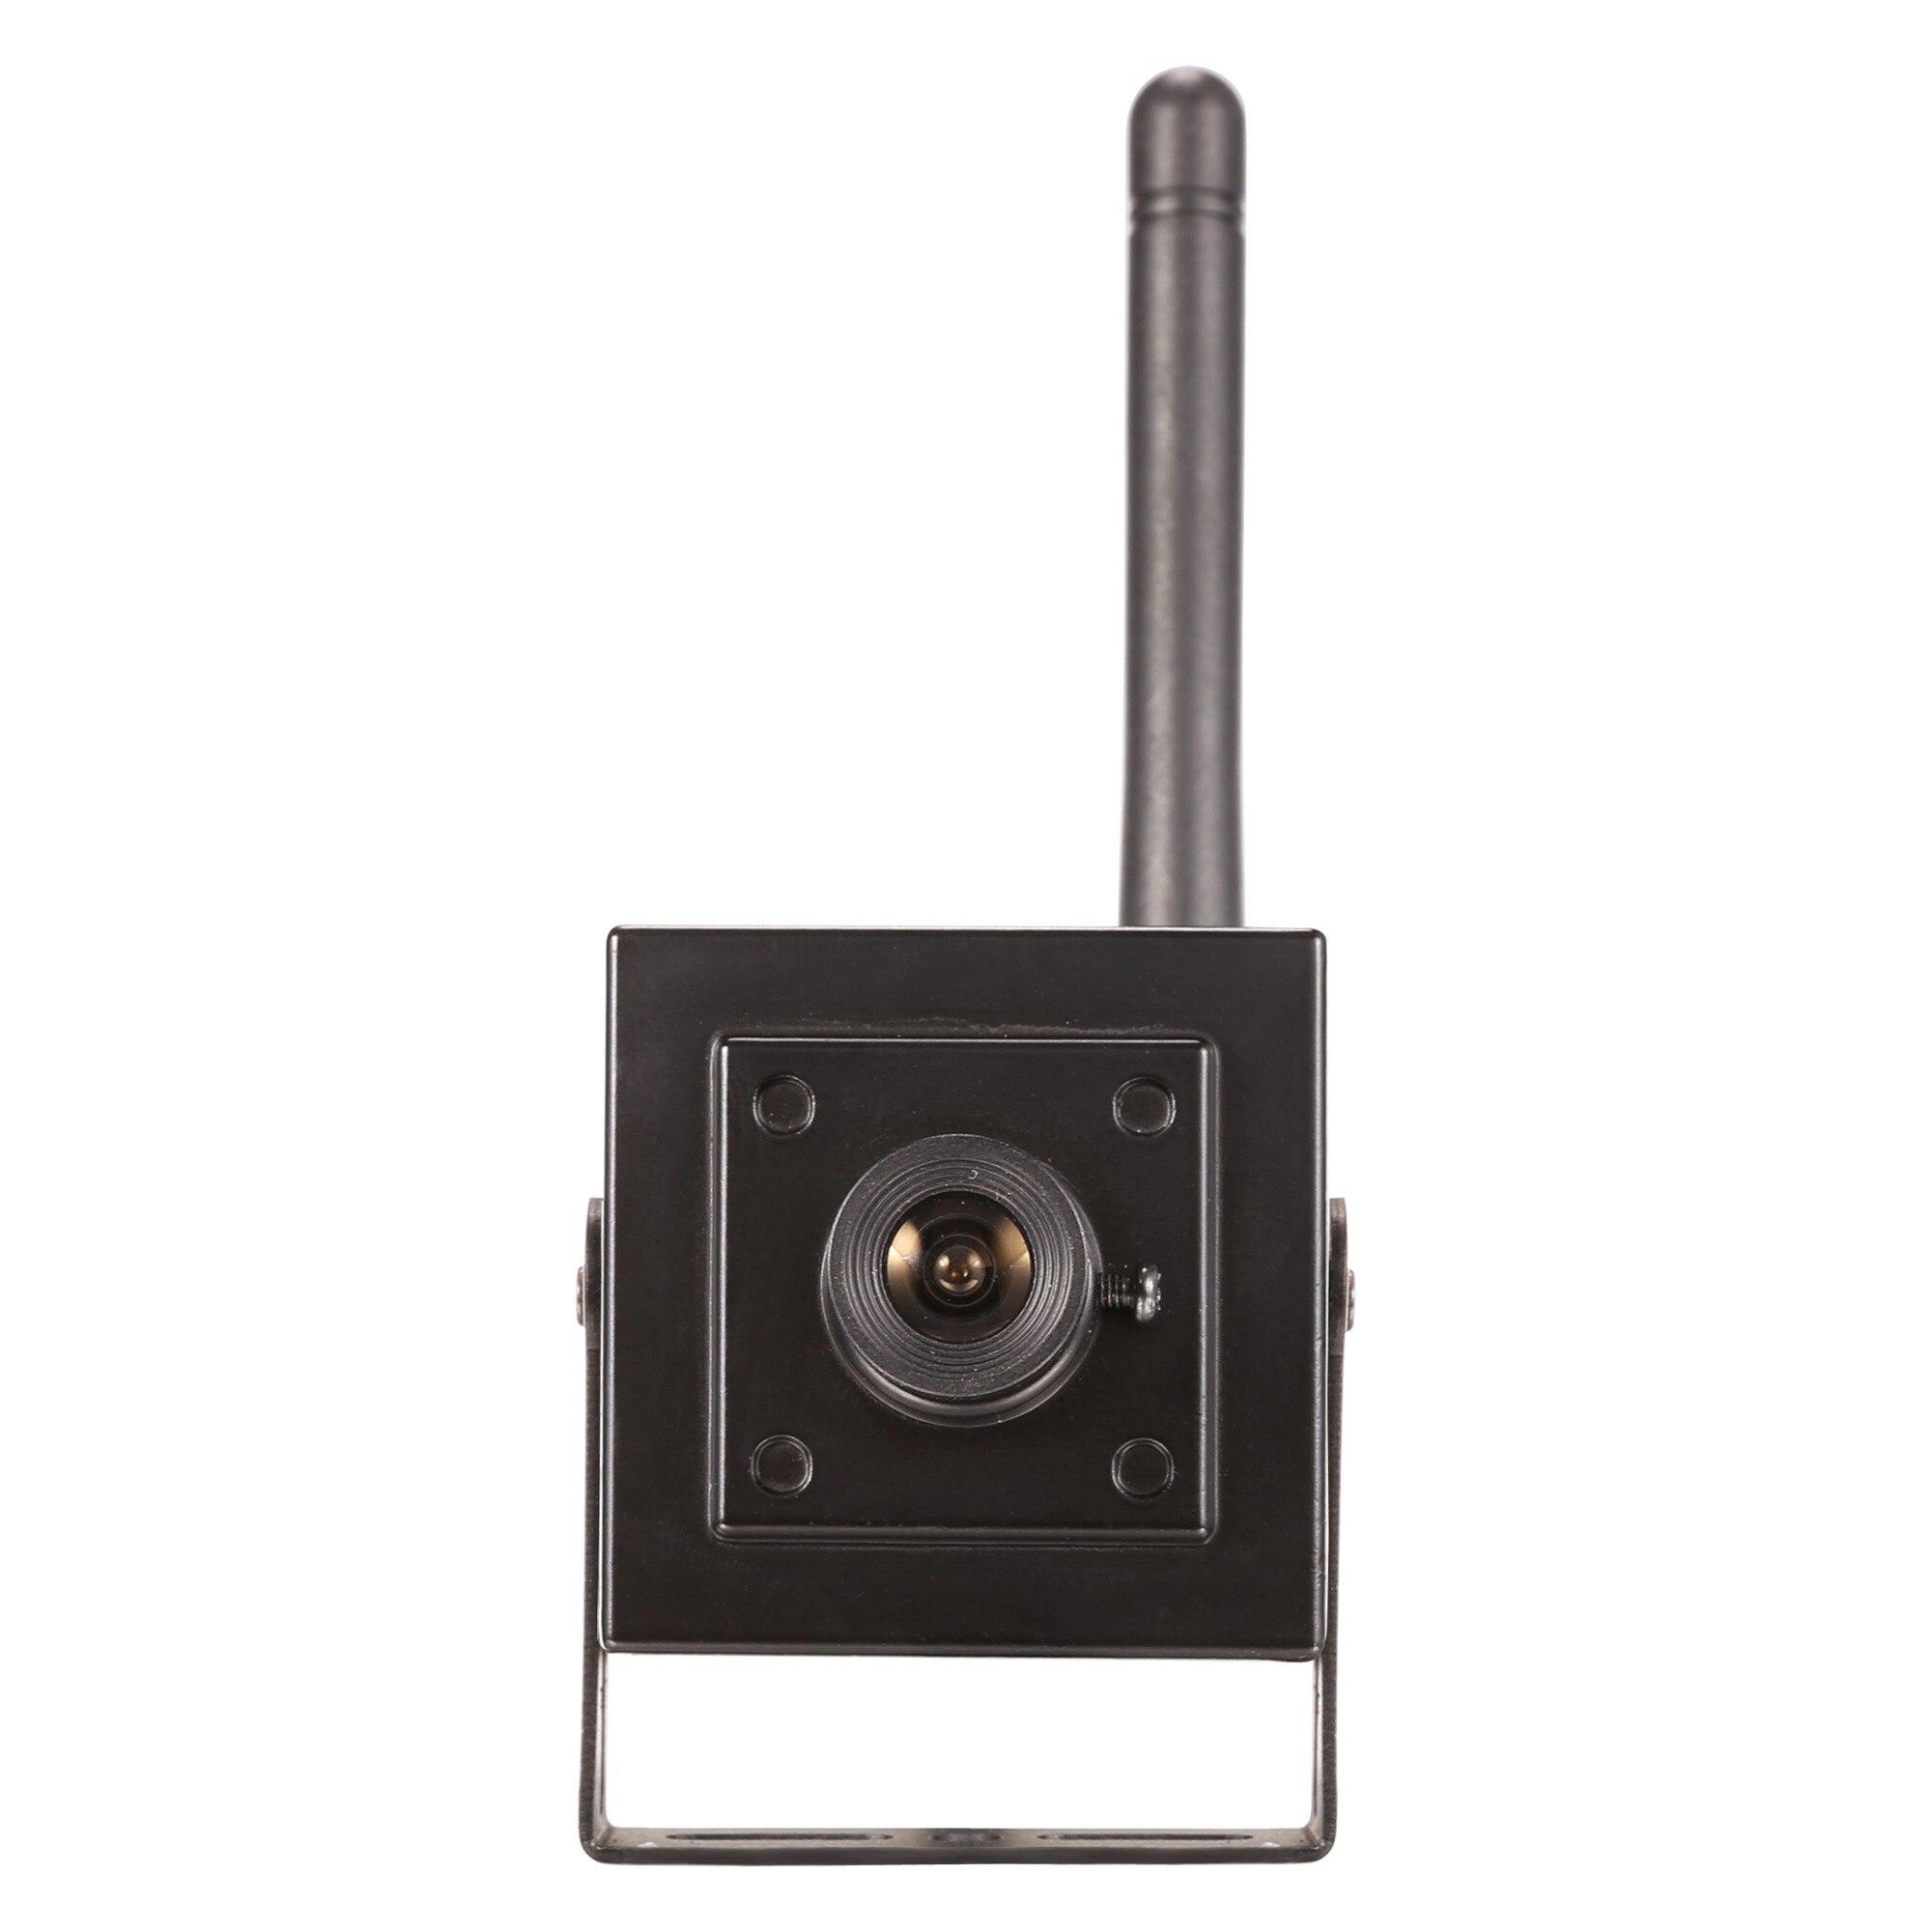 Wireless CCTV Camera Mini IP Camera Wi Fi 1080p HD Micro SD card slot 128G